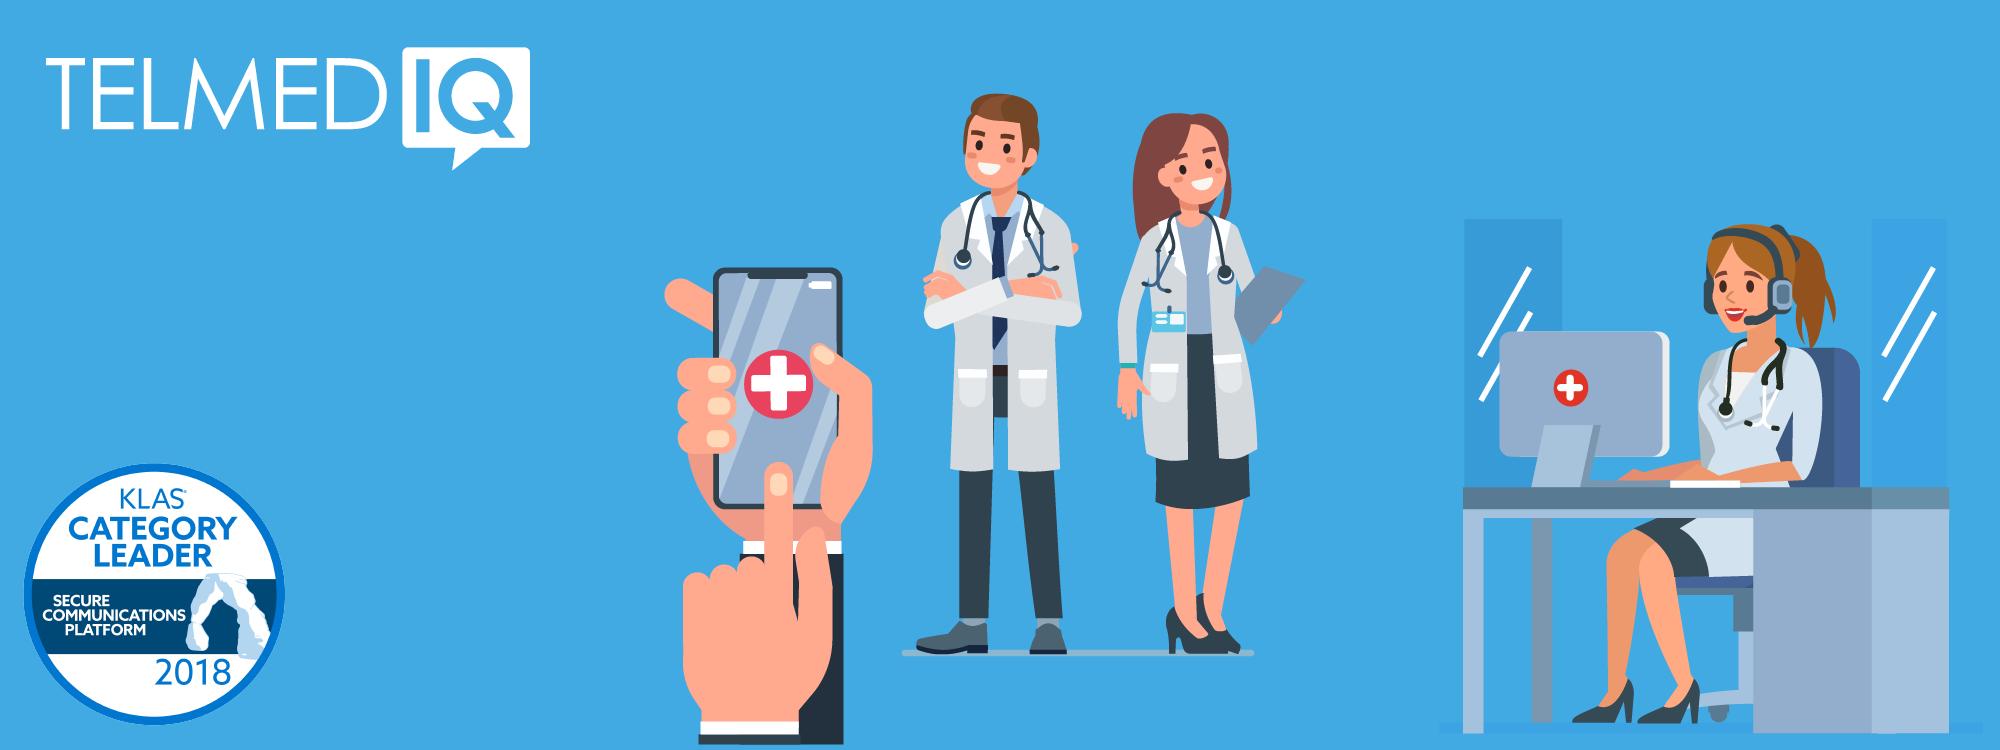 Telmediq-Call-Center-Top-3-Issues